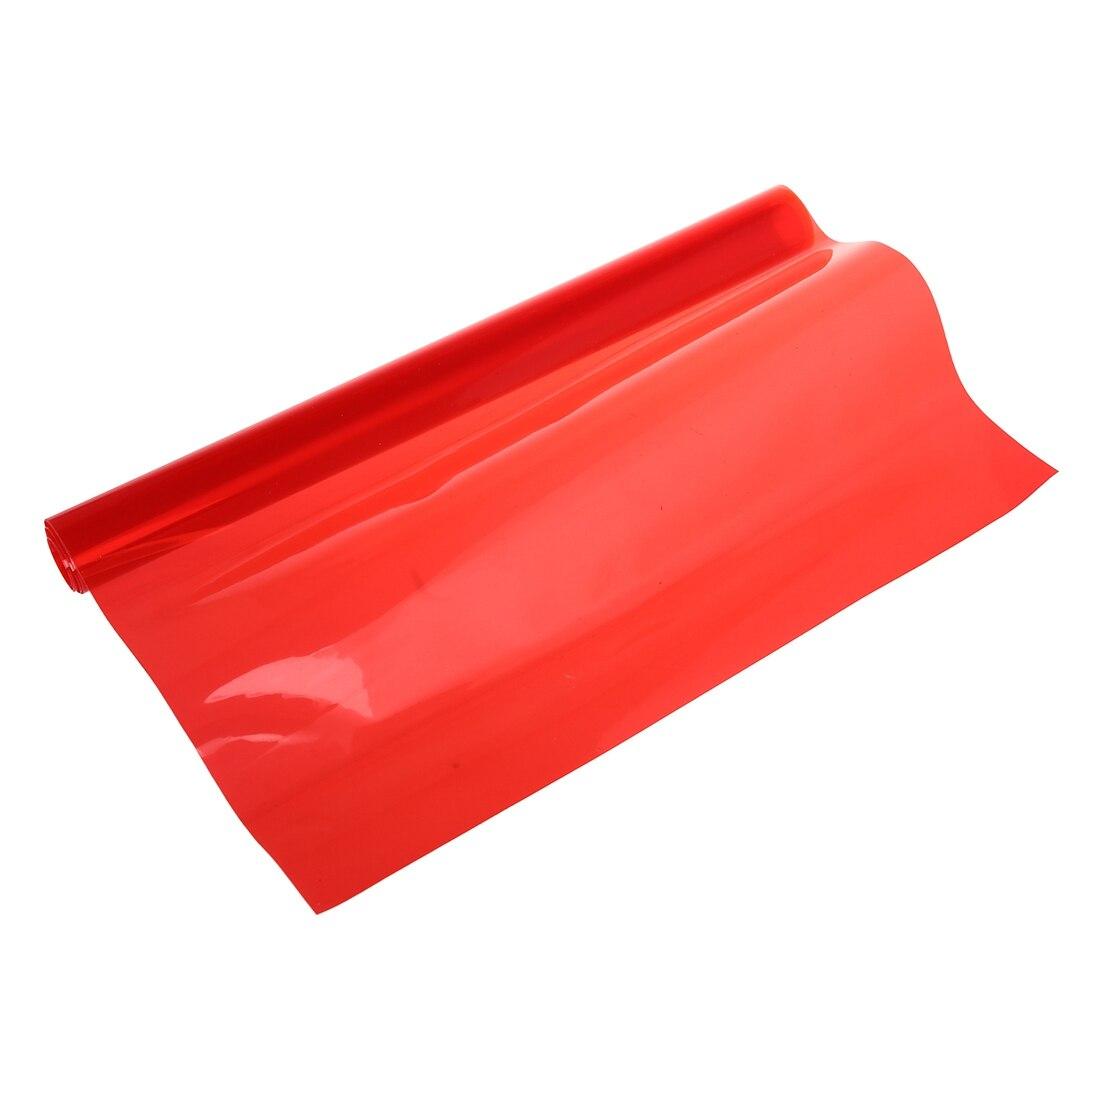 Red Car Tail Fog Head Light Headlight Tint Film Cover 30x60cm